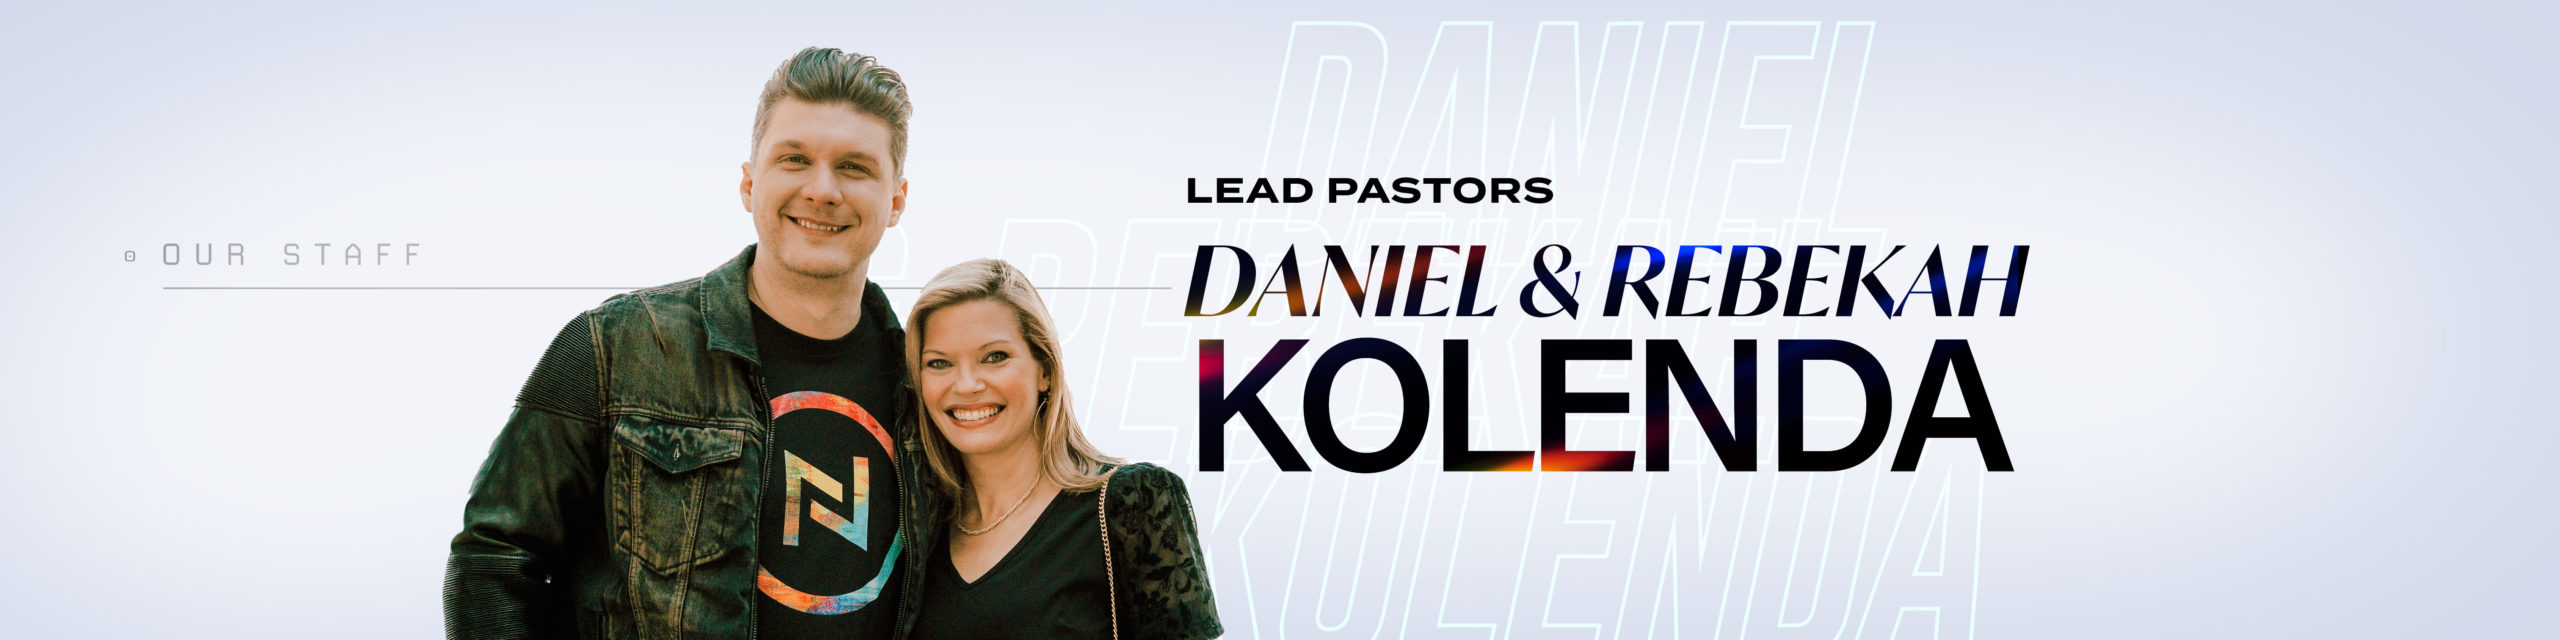 Daniel and Rebekah Kolenda - Lead Pastors of Nations Church Orlando